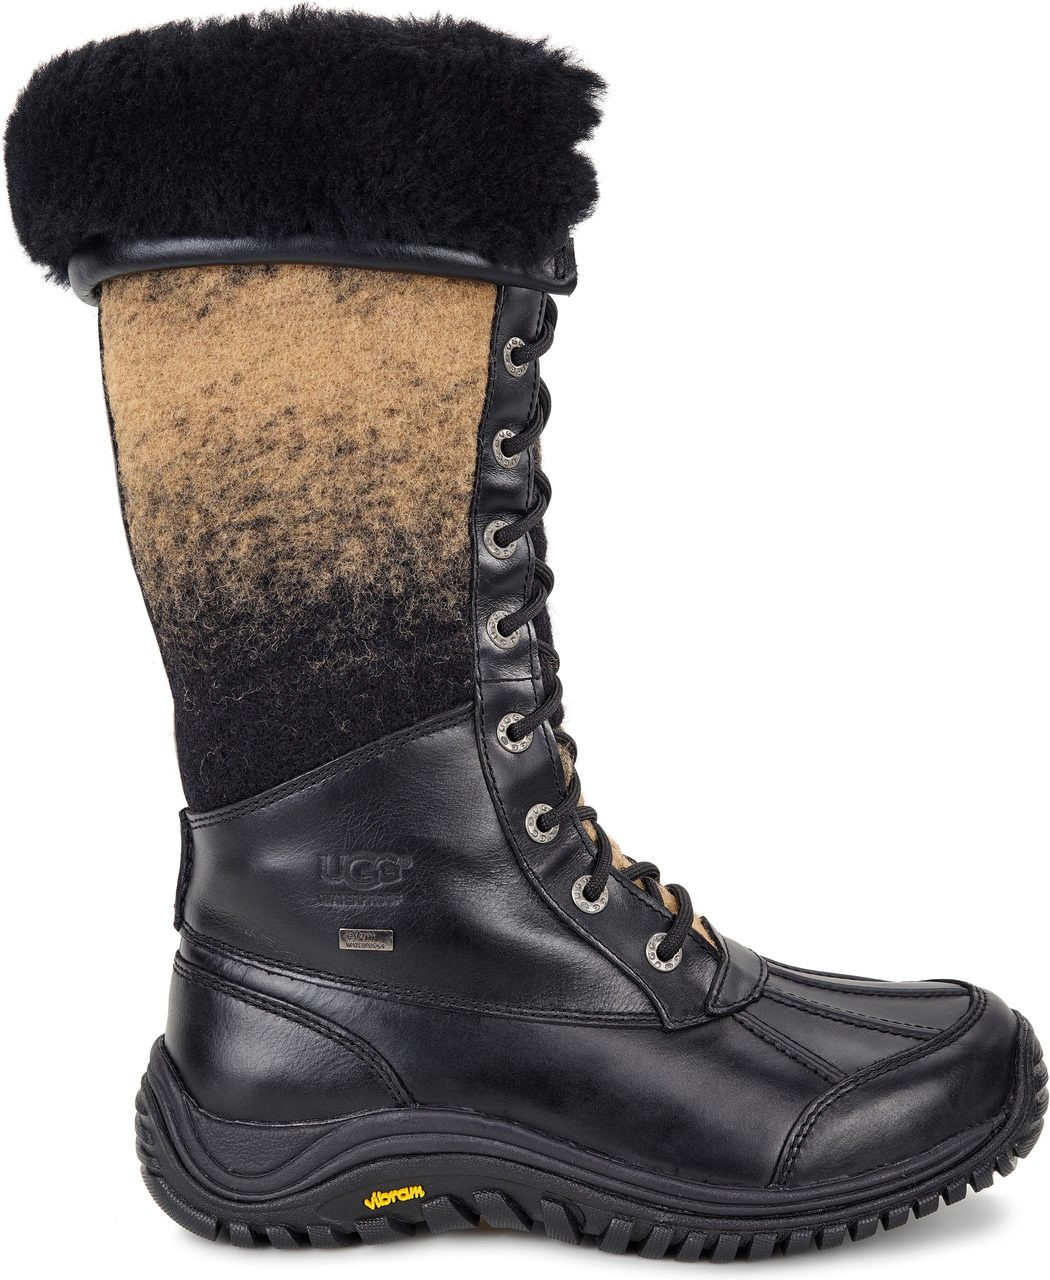 Ugg Adirondack Black Tall